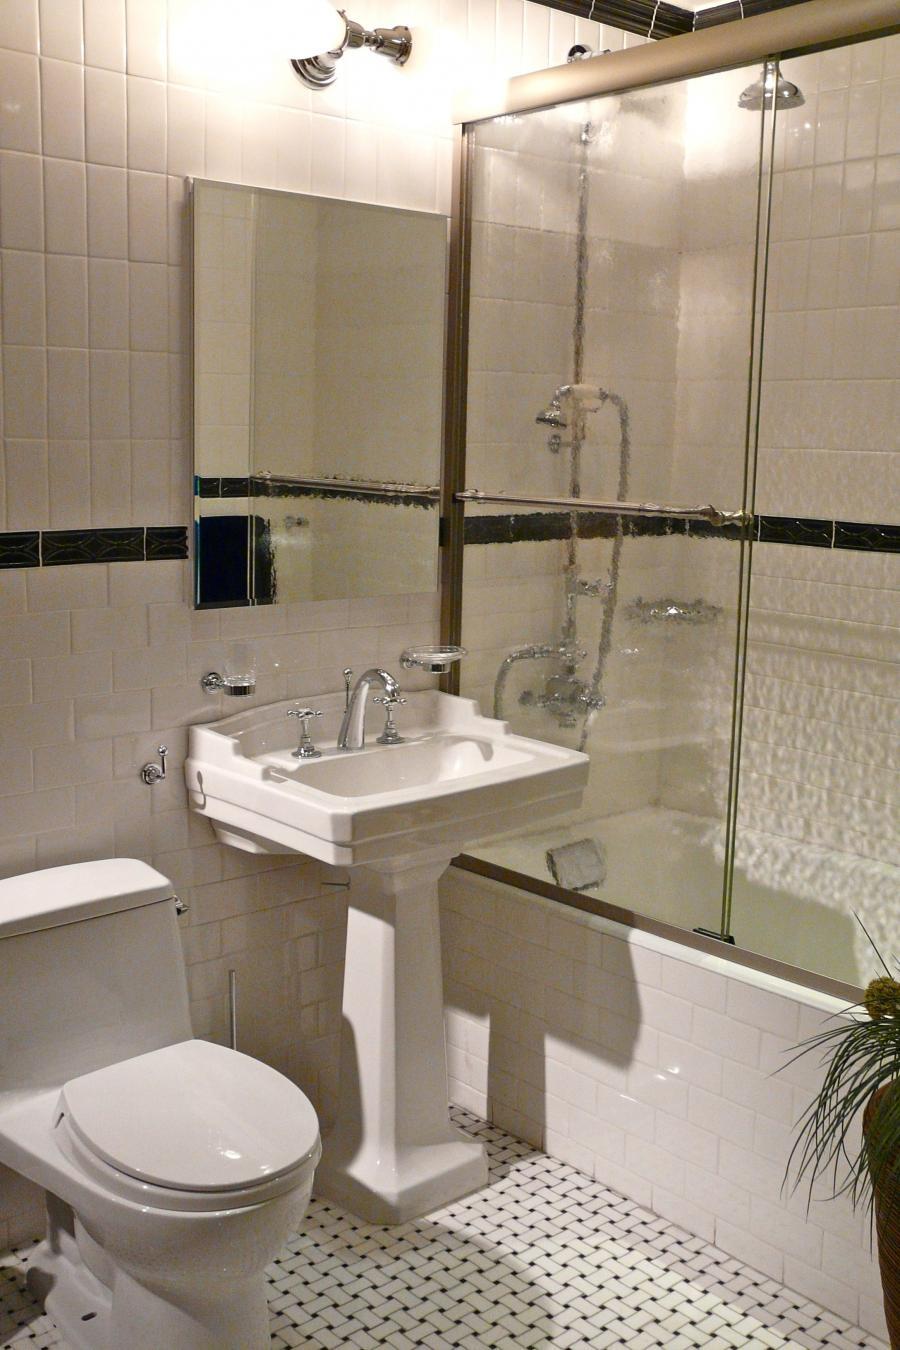 Remodeled Bathroom Photo Galleries